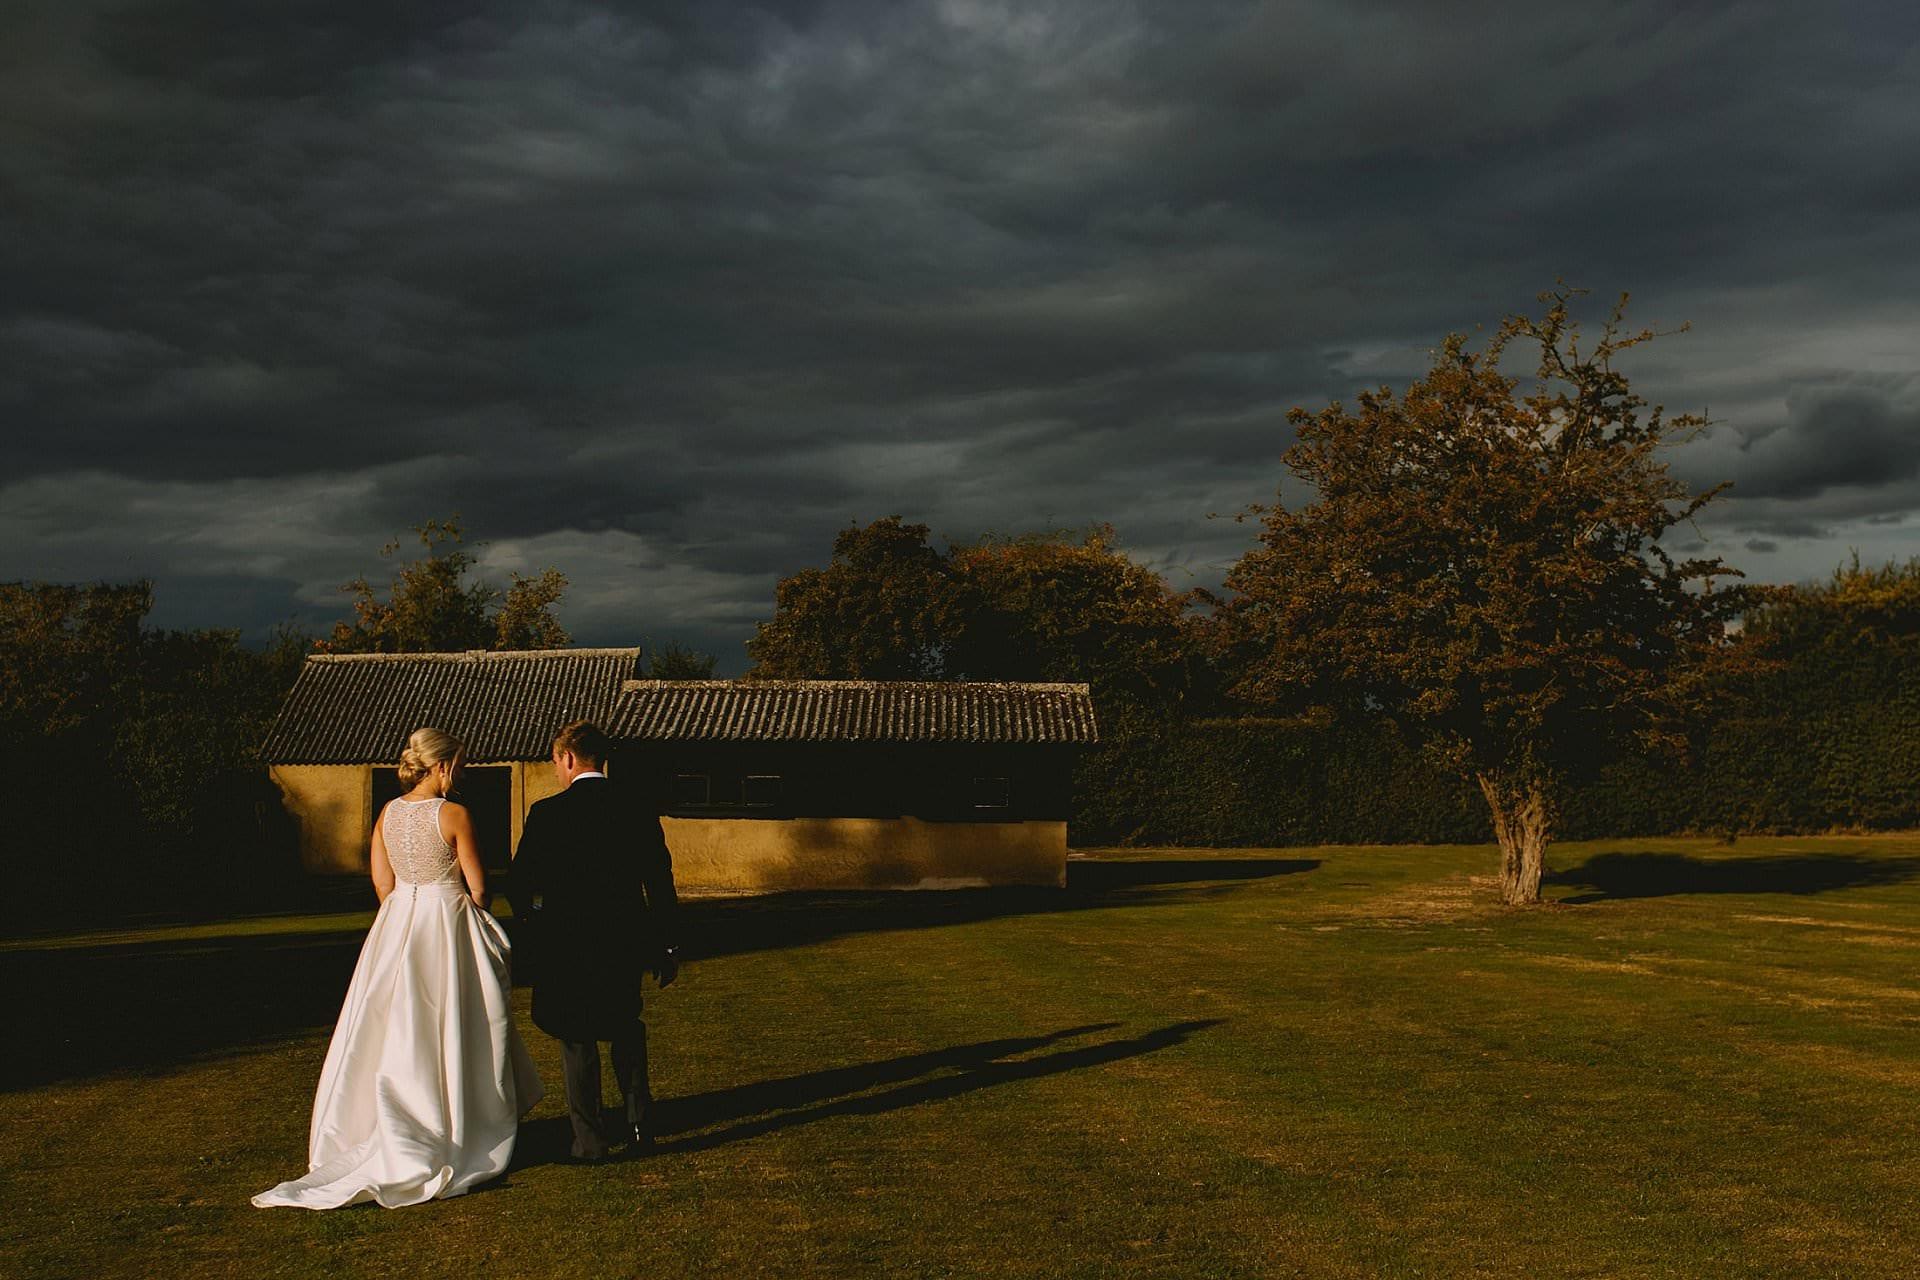 Bride and groom walk away with dark rain clouds above